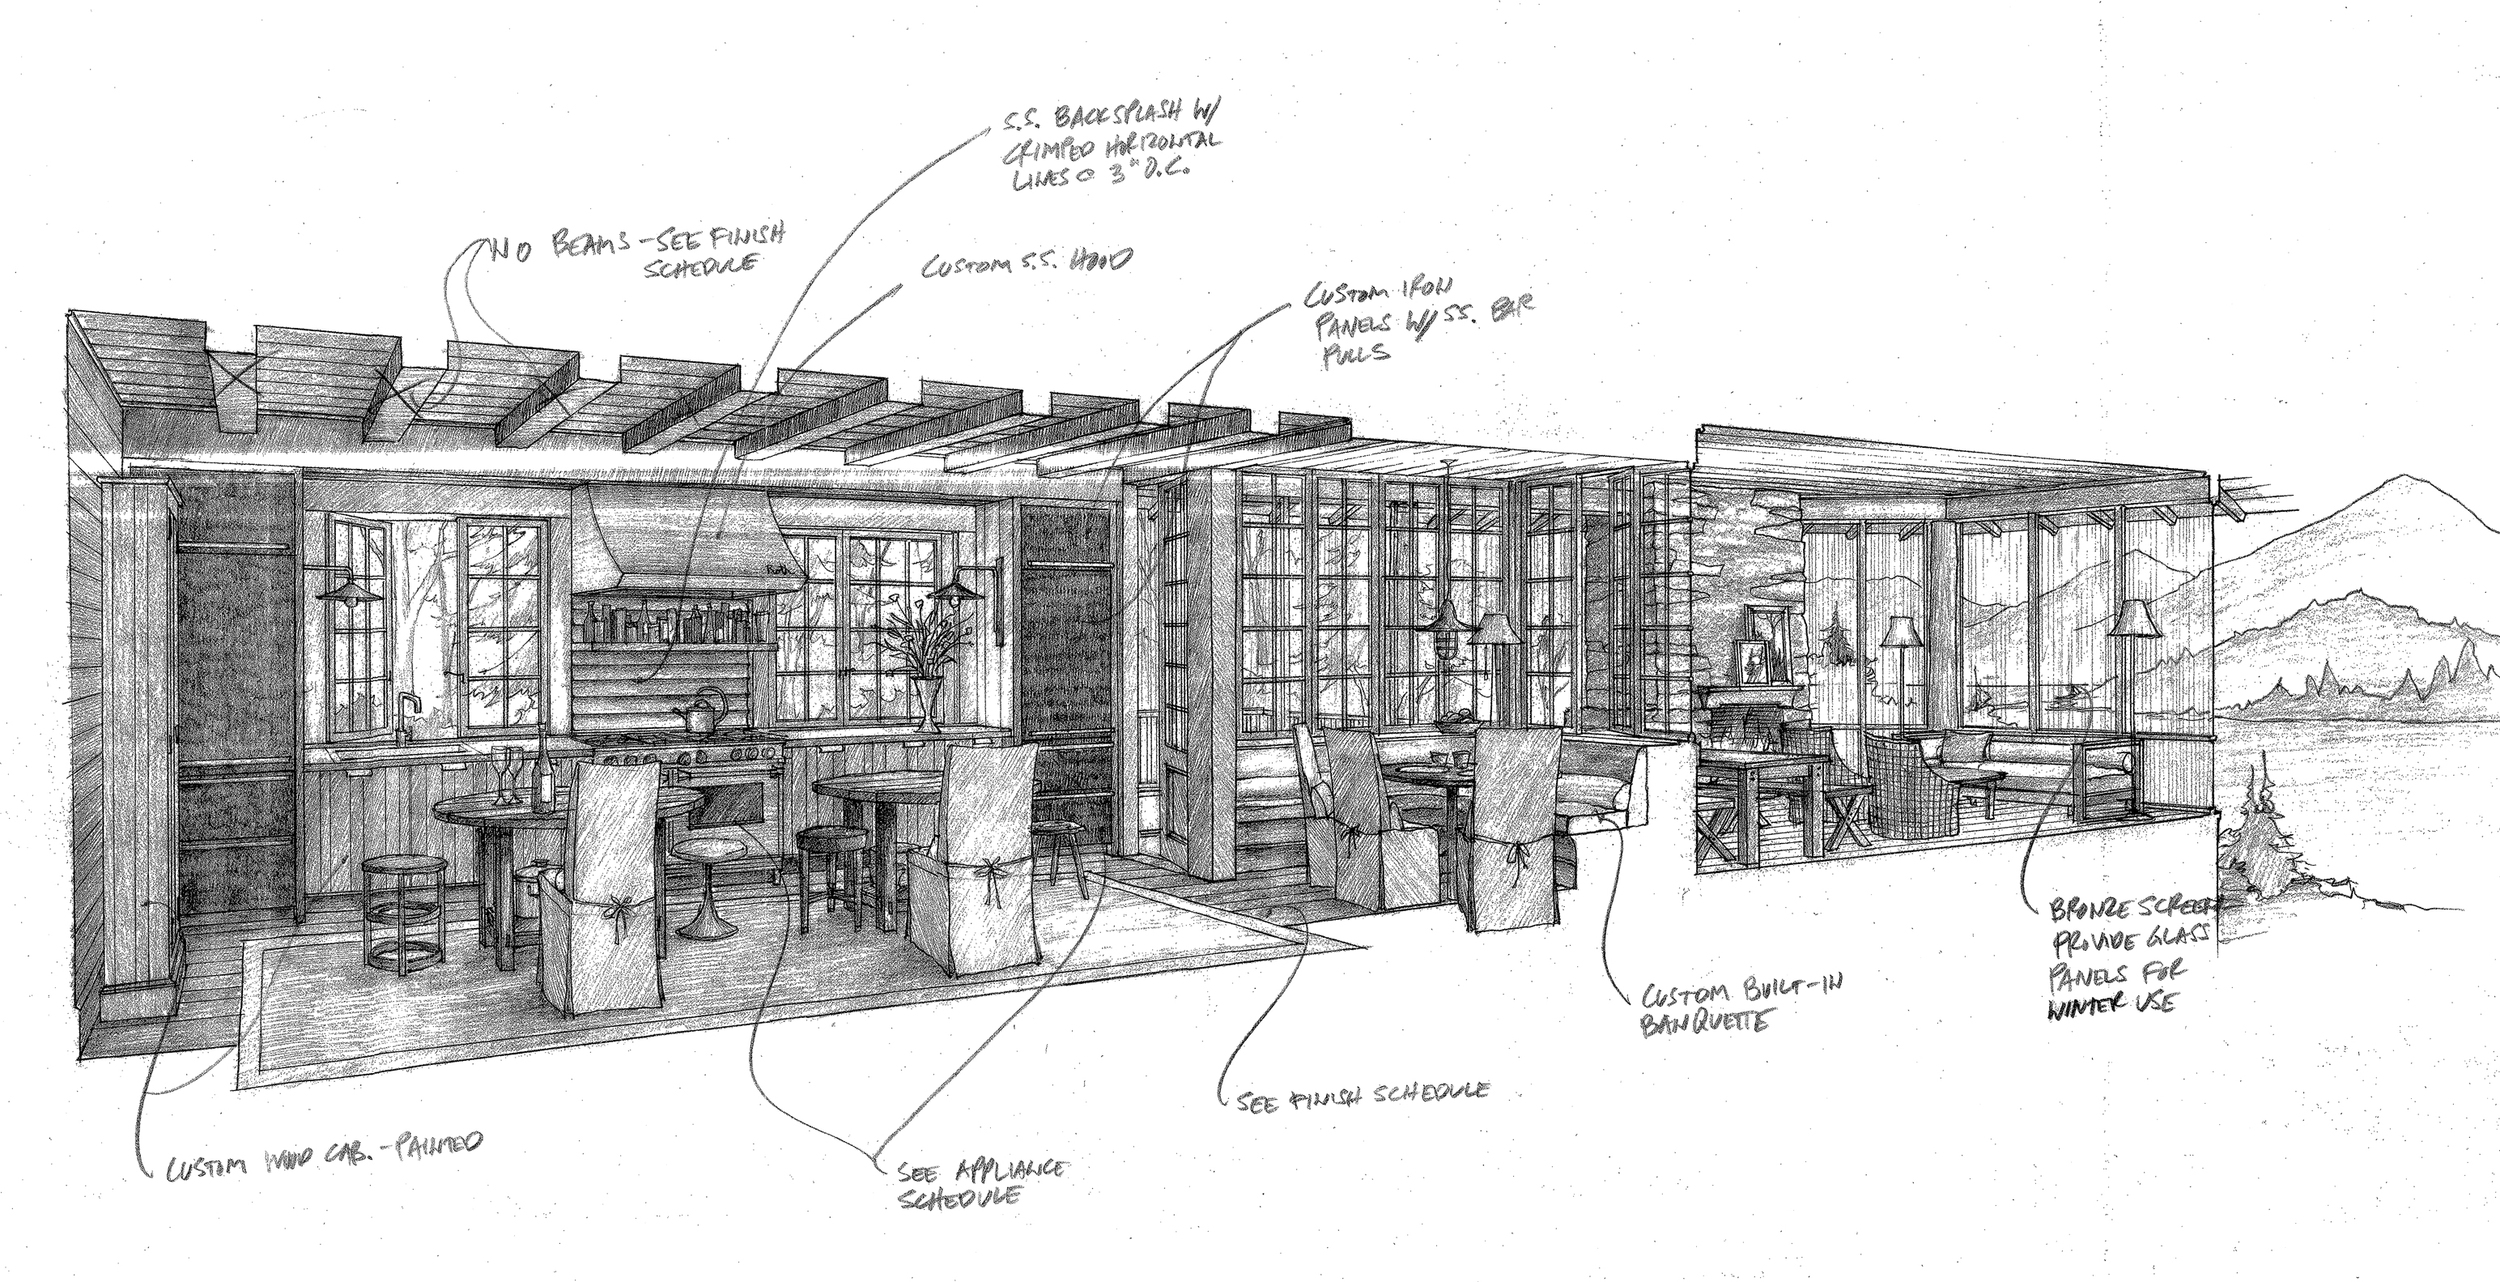 Lake_Placid.New_York.Lake_House.Robert_Orr_&_Associates.Architecture.Landscape_Architecture.Urbanism.Camp.Kitchen_Perspective.Mark_Kline_Del.Pursley_Dixon.jpg